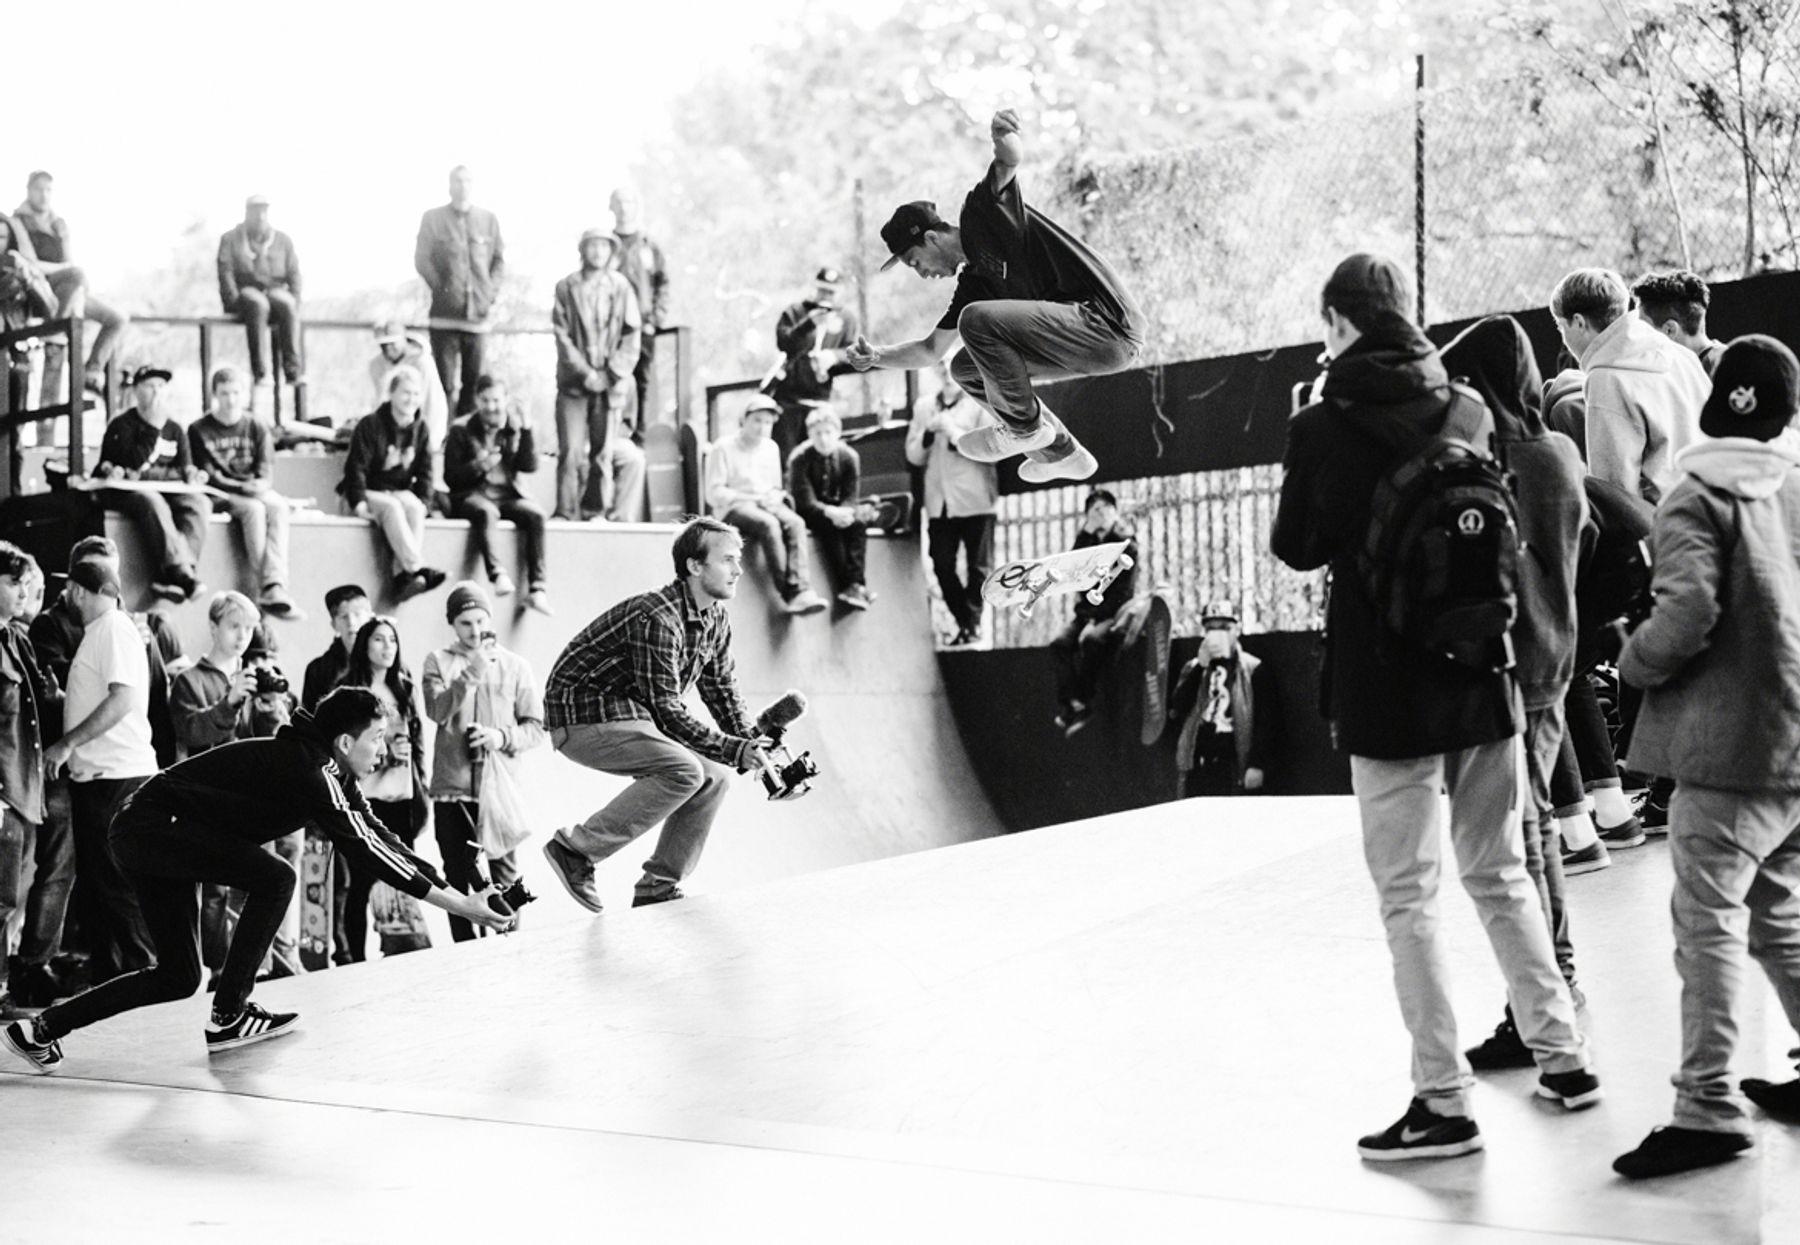 _IHC2612e-Nick-Tucker-Nollie-Double-Heelflip-Primitive-Skateboards-Demo-BaySixty6-London-May-2015-Photographer-Maksim-Kalanep